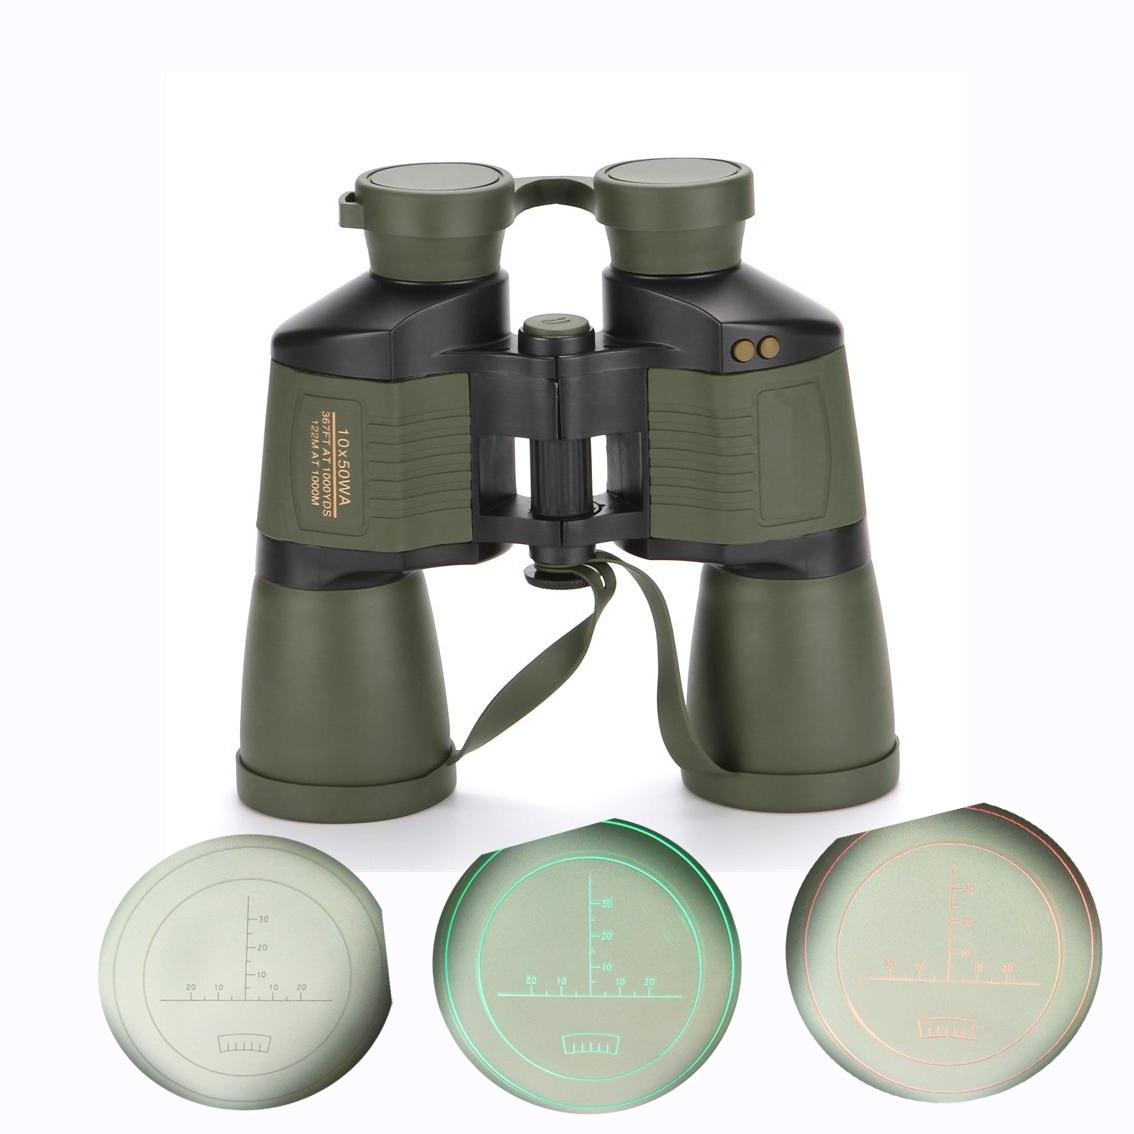 HD Brand 10X50 Auto focus waterproof rangefinder binoculars telescope hunting tourism optical outdoor sports eyepiece binoculars